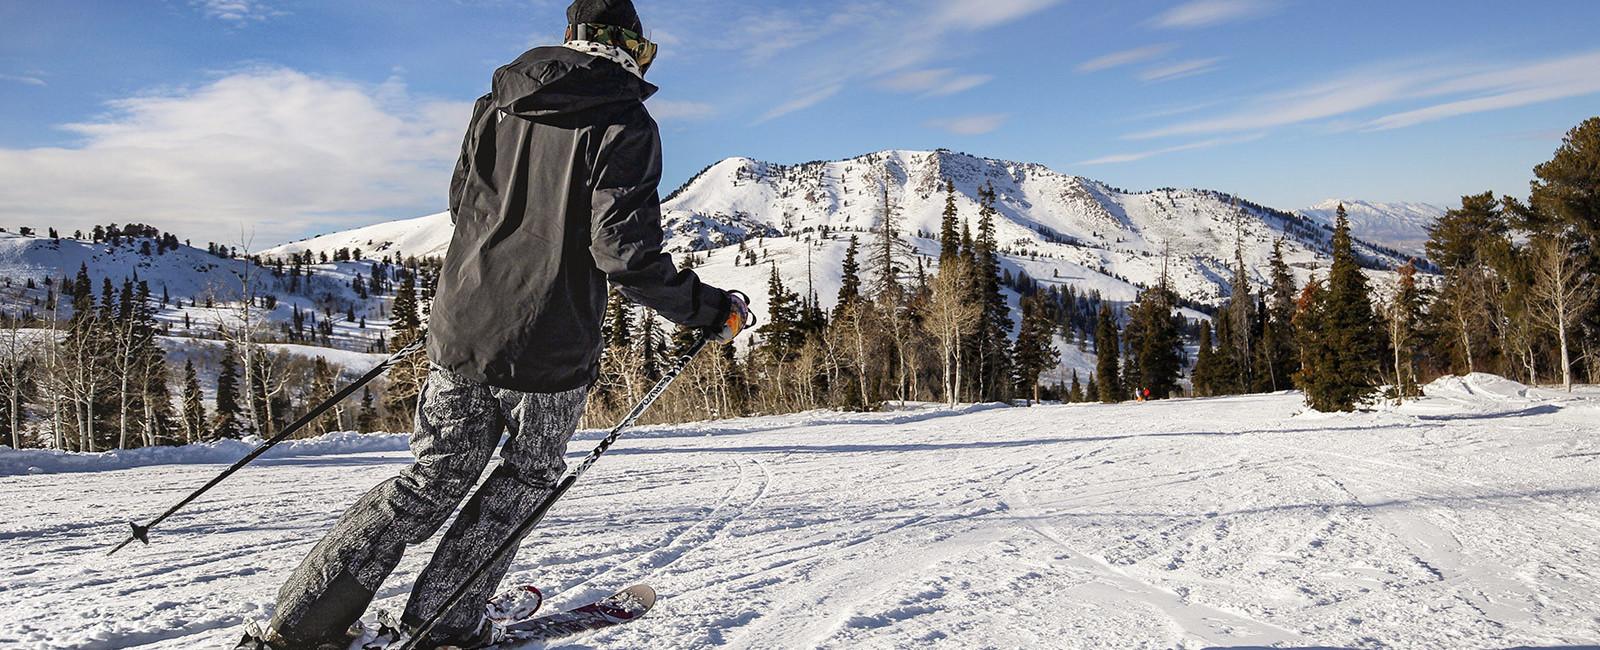 Powder Mountain First Time Ski and Snowboard Program